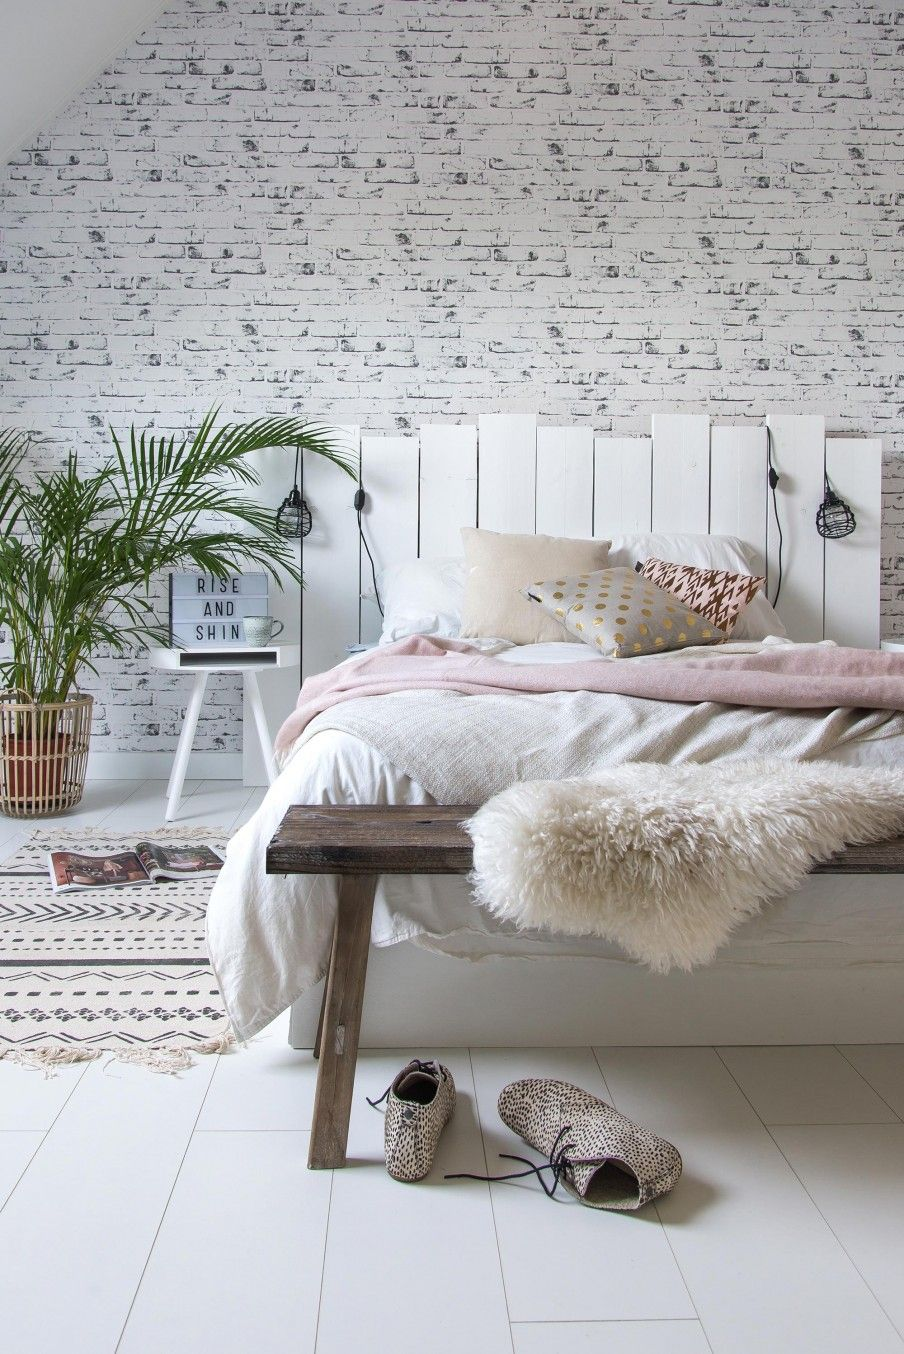 diy-hoofdbord | bedroom inspiration | @vtwonen 11-2016 | Fotografie en styling Anne Heijmans